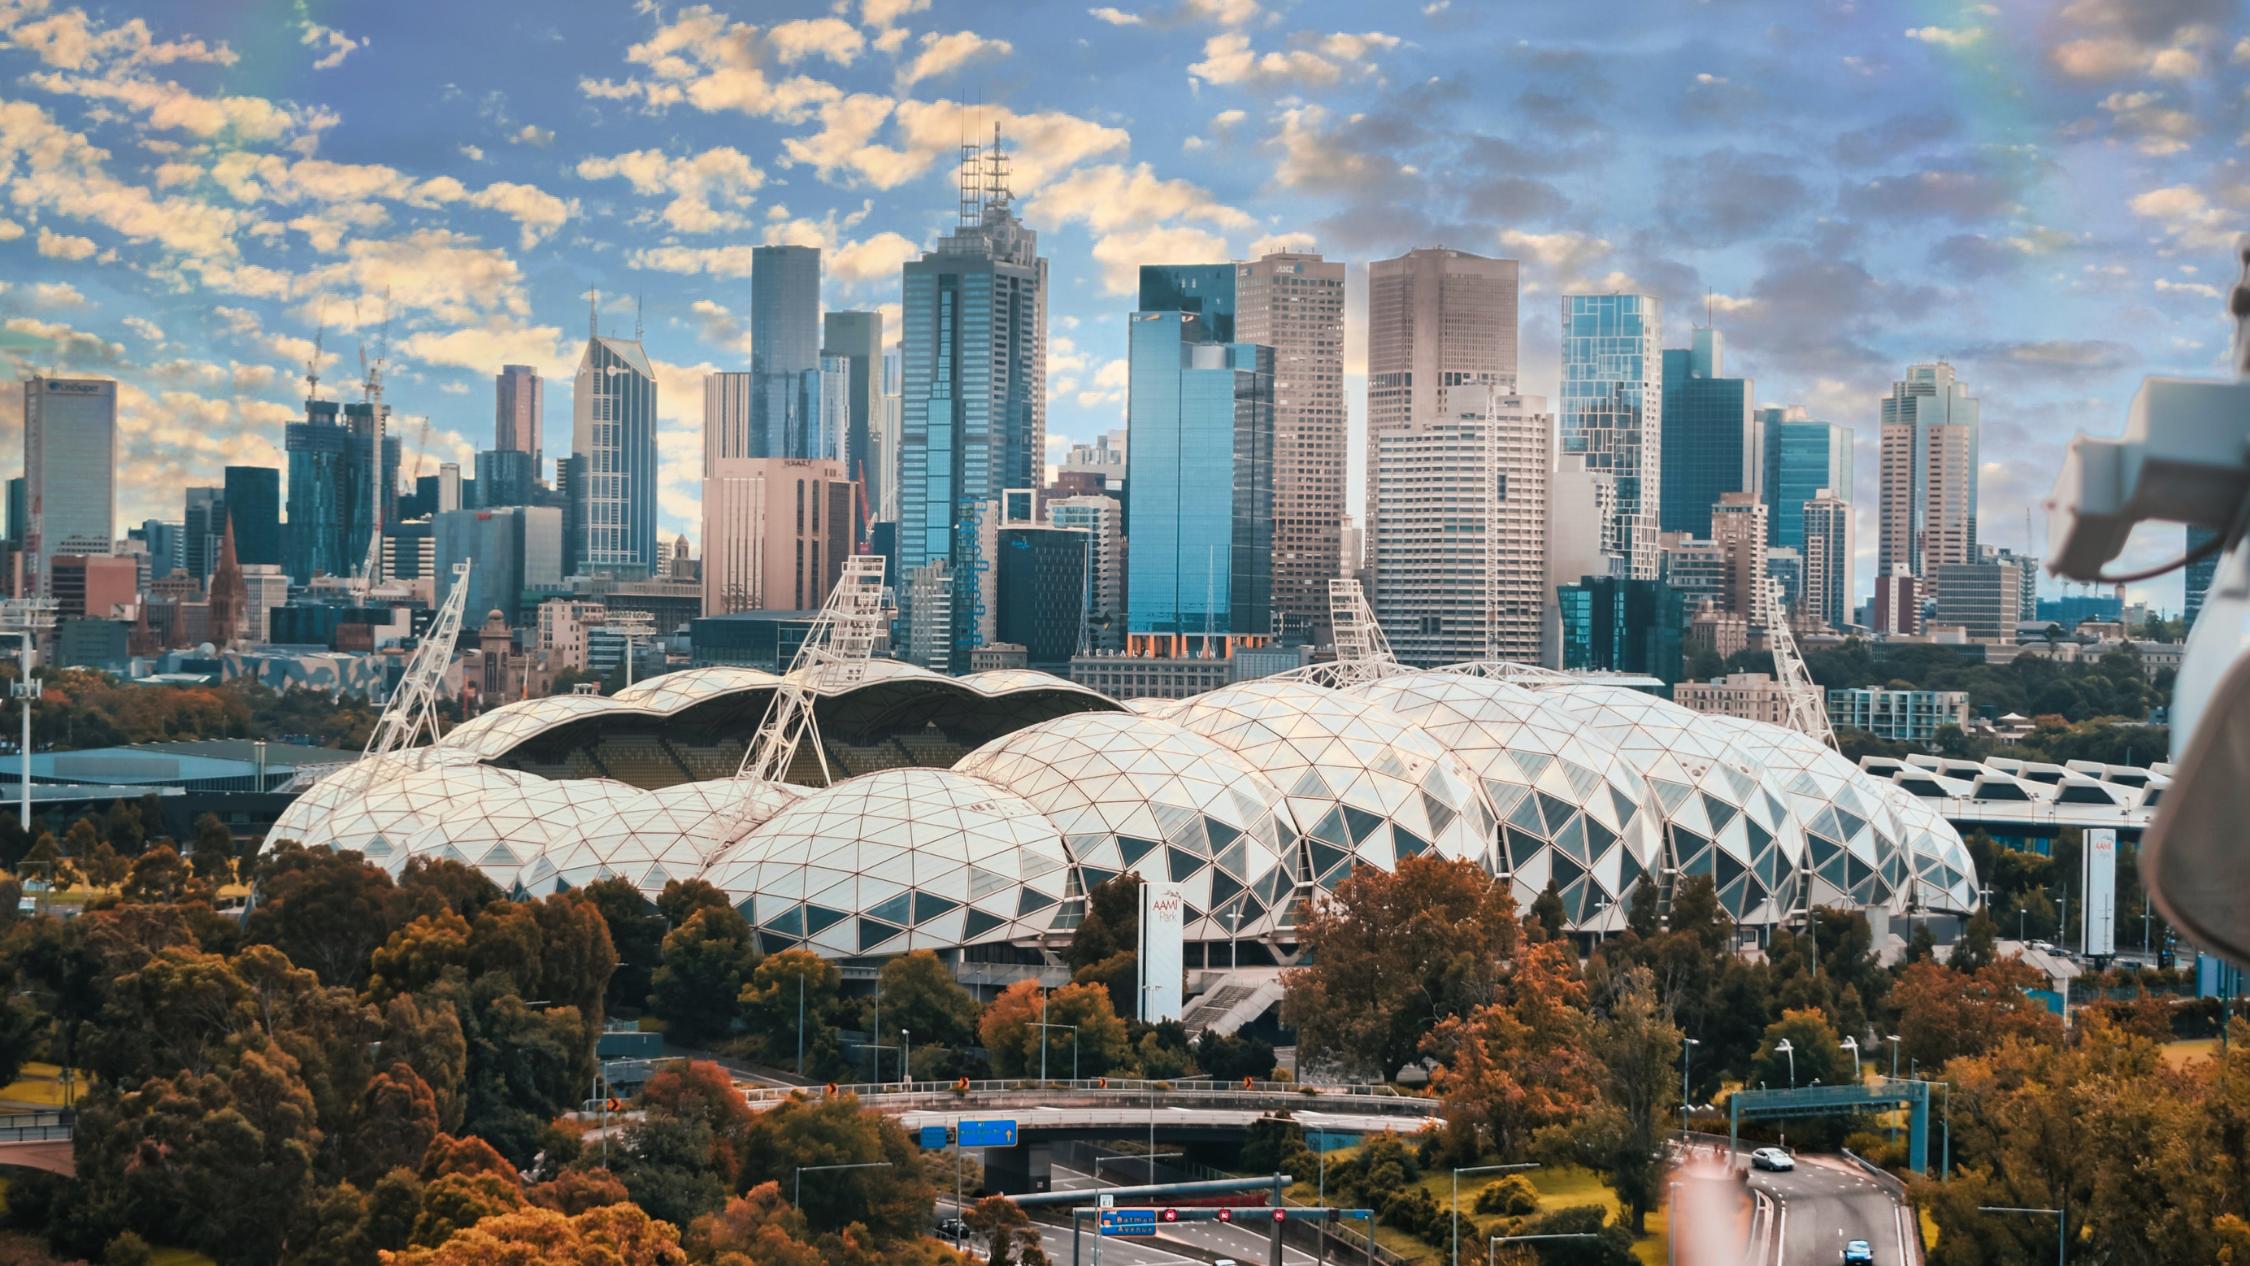 Photograph of the Melbourne CBD skyline.